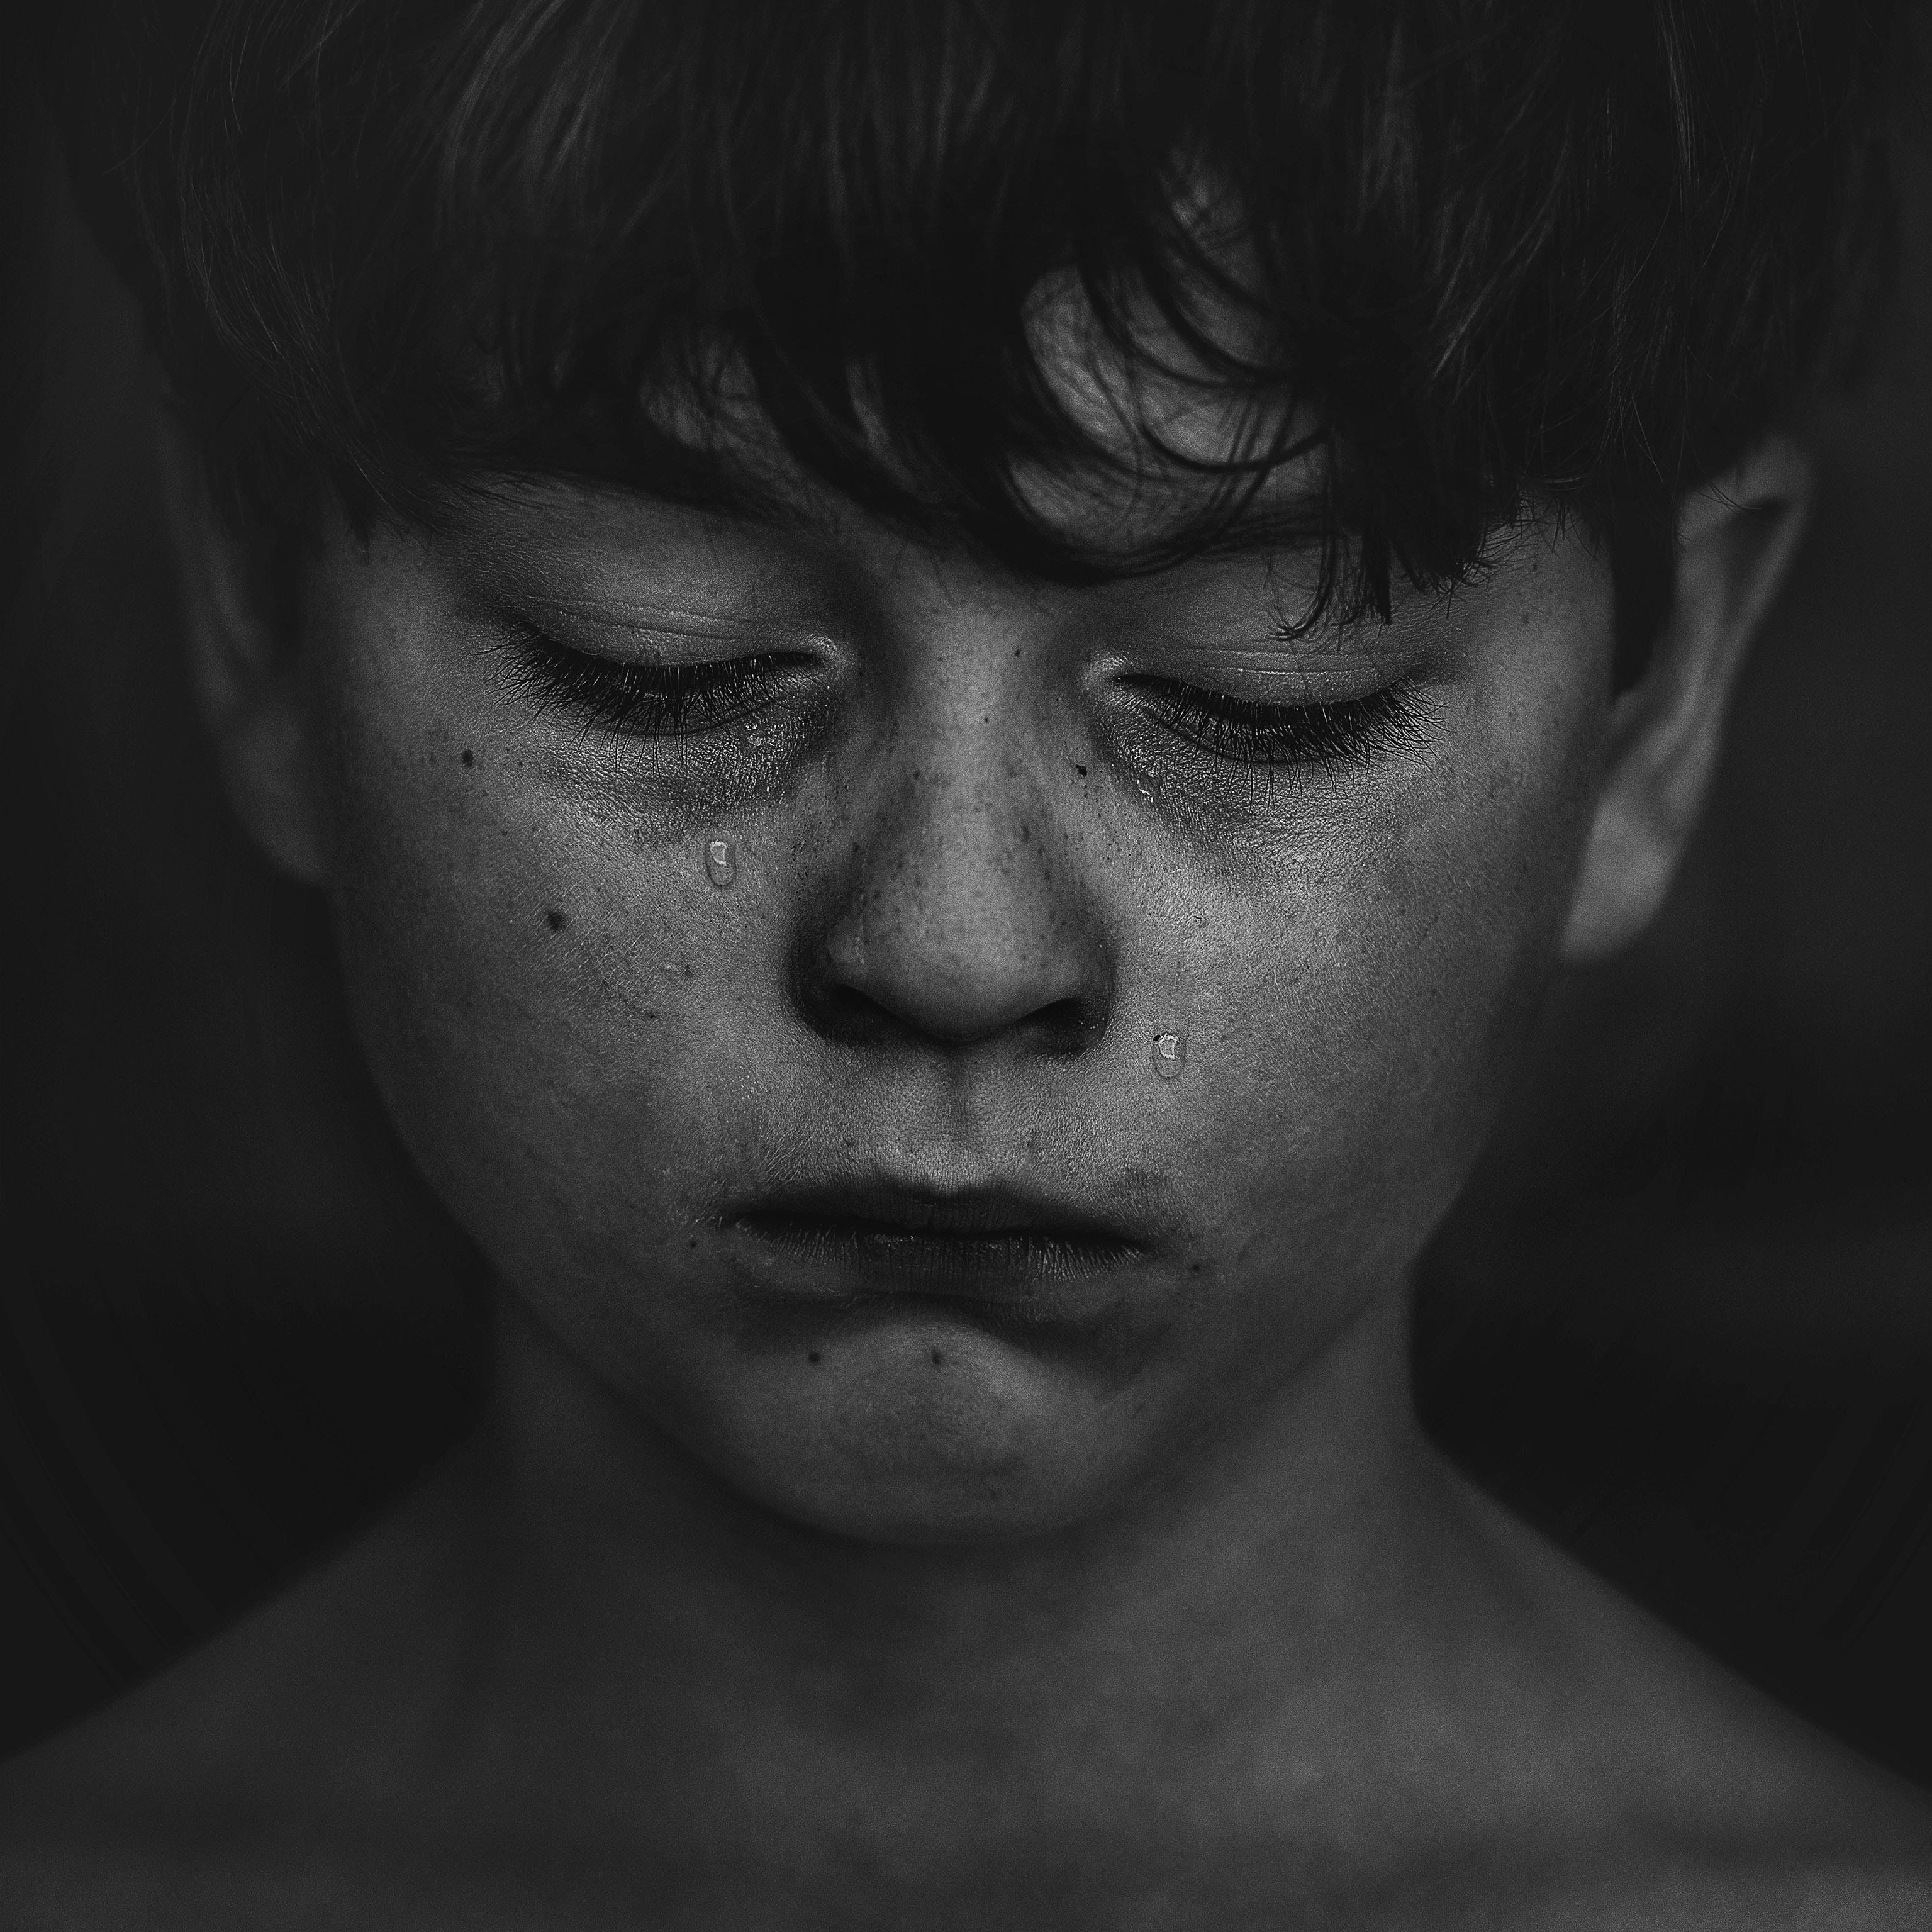 Boy crying | Photo: Unsplash/Kat J